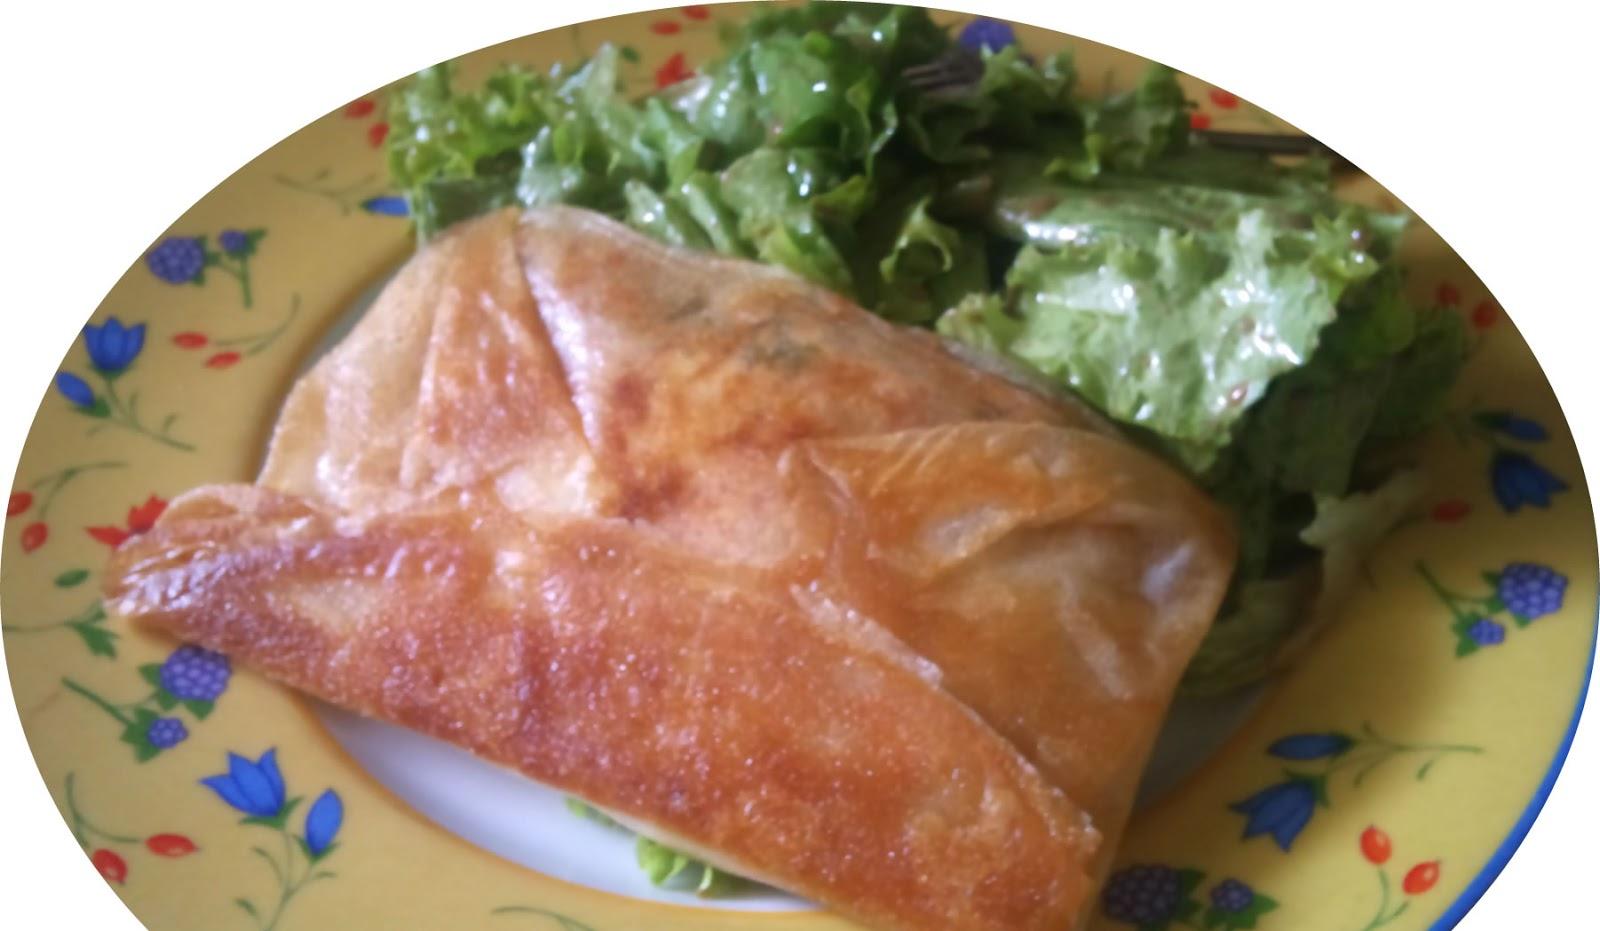 street food cuisine du monde recette de brick au thon tunisie. Black Bedroom Furniture Sets. Home Design Ideas